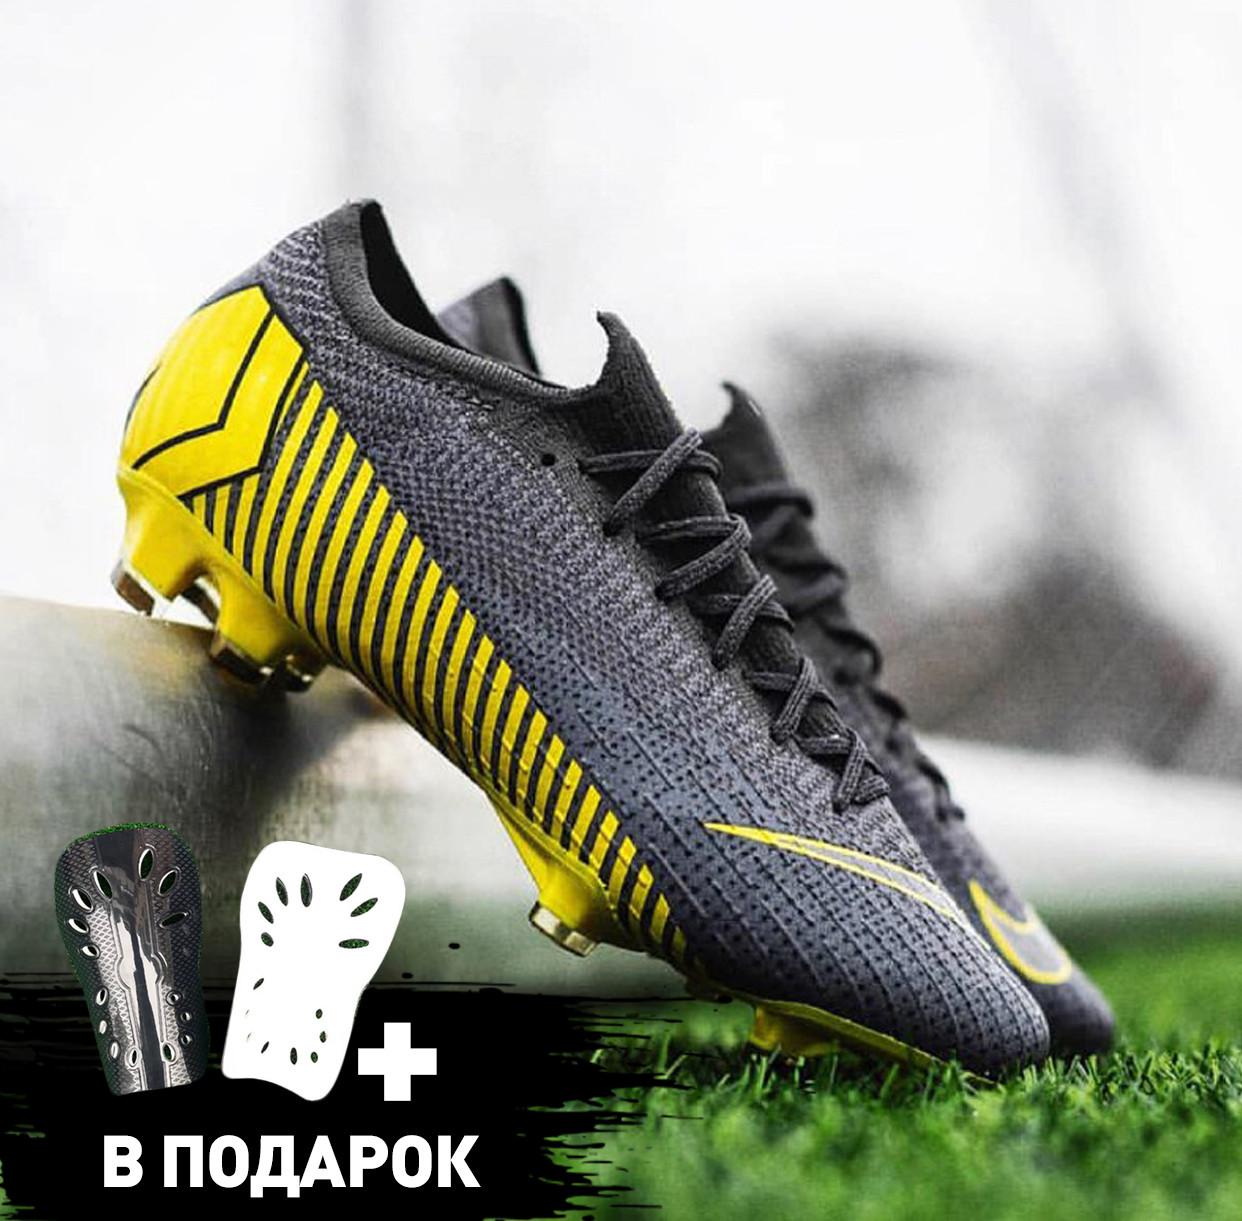 8d7912dea2856e Бутсы ( Найк ) Nike Mercurial 360 Game Over XII Elite - Sport Exclusive  магазин футбольной